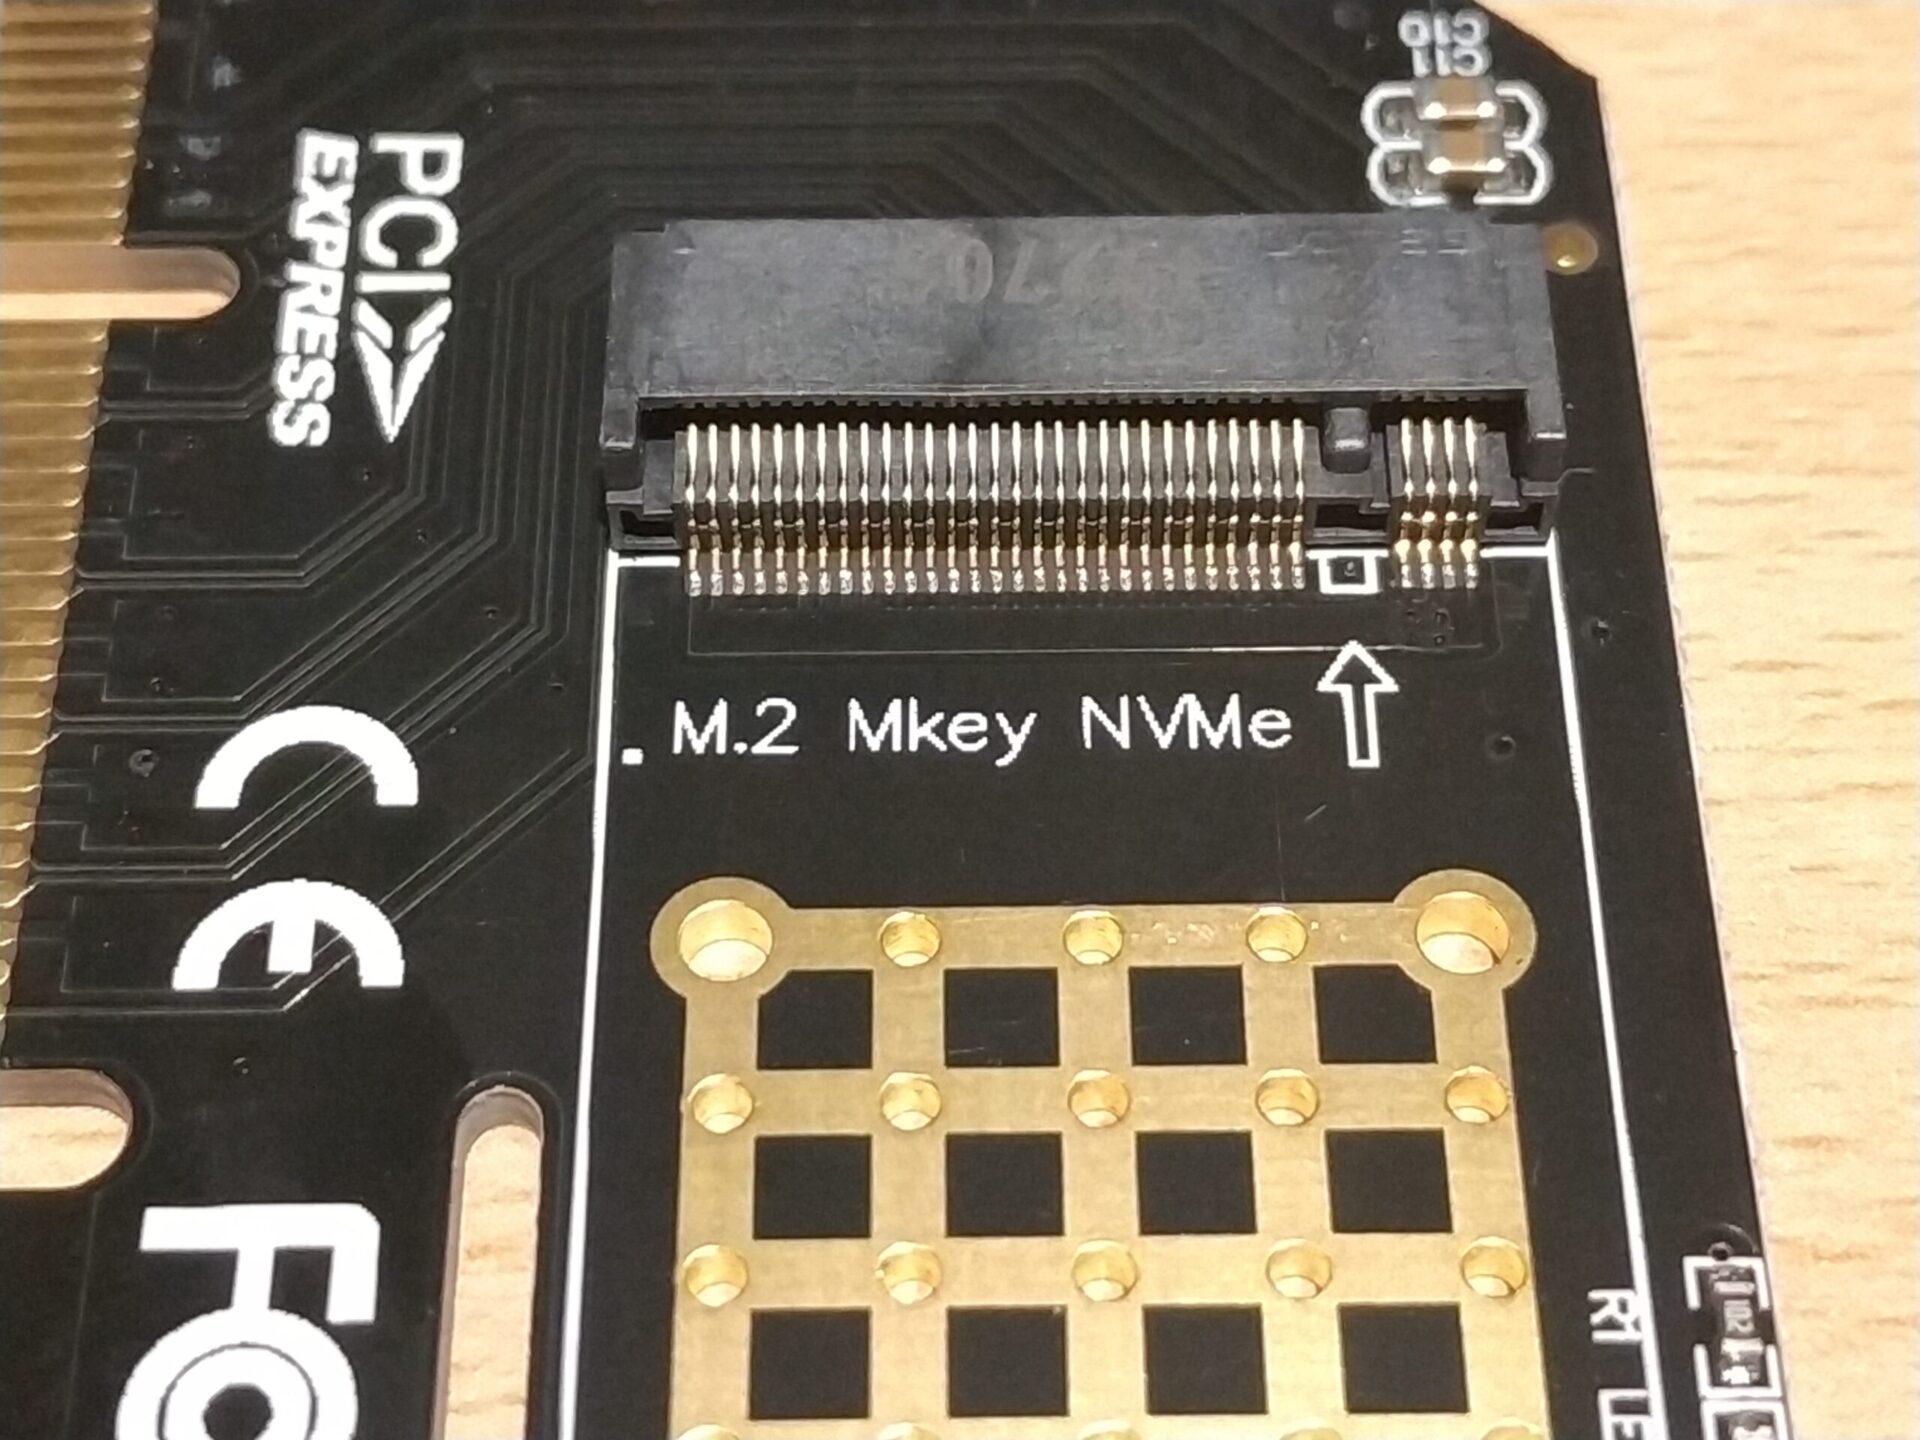 m.2 slot m-key